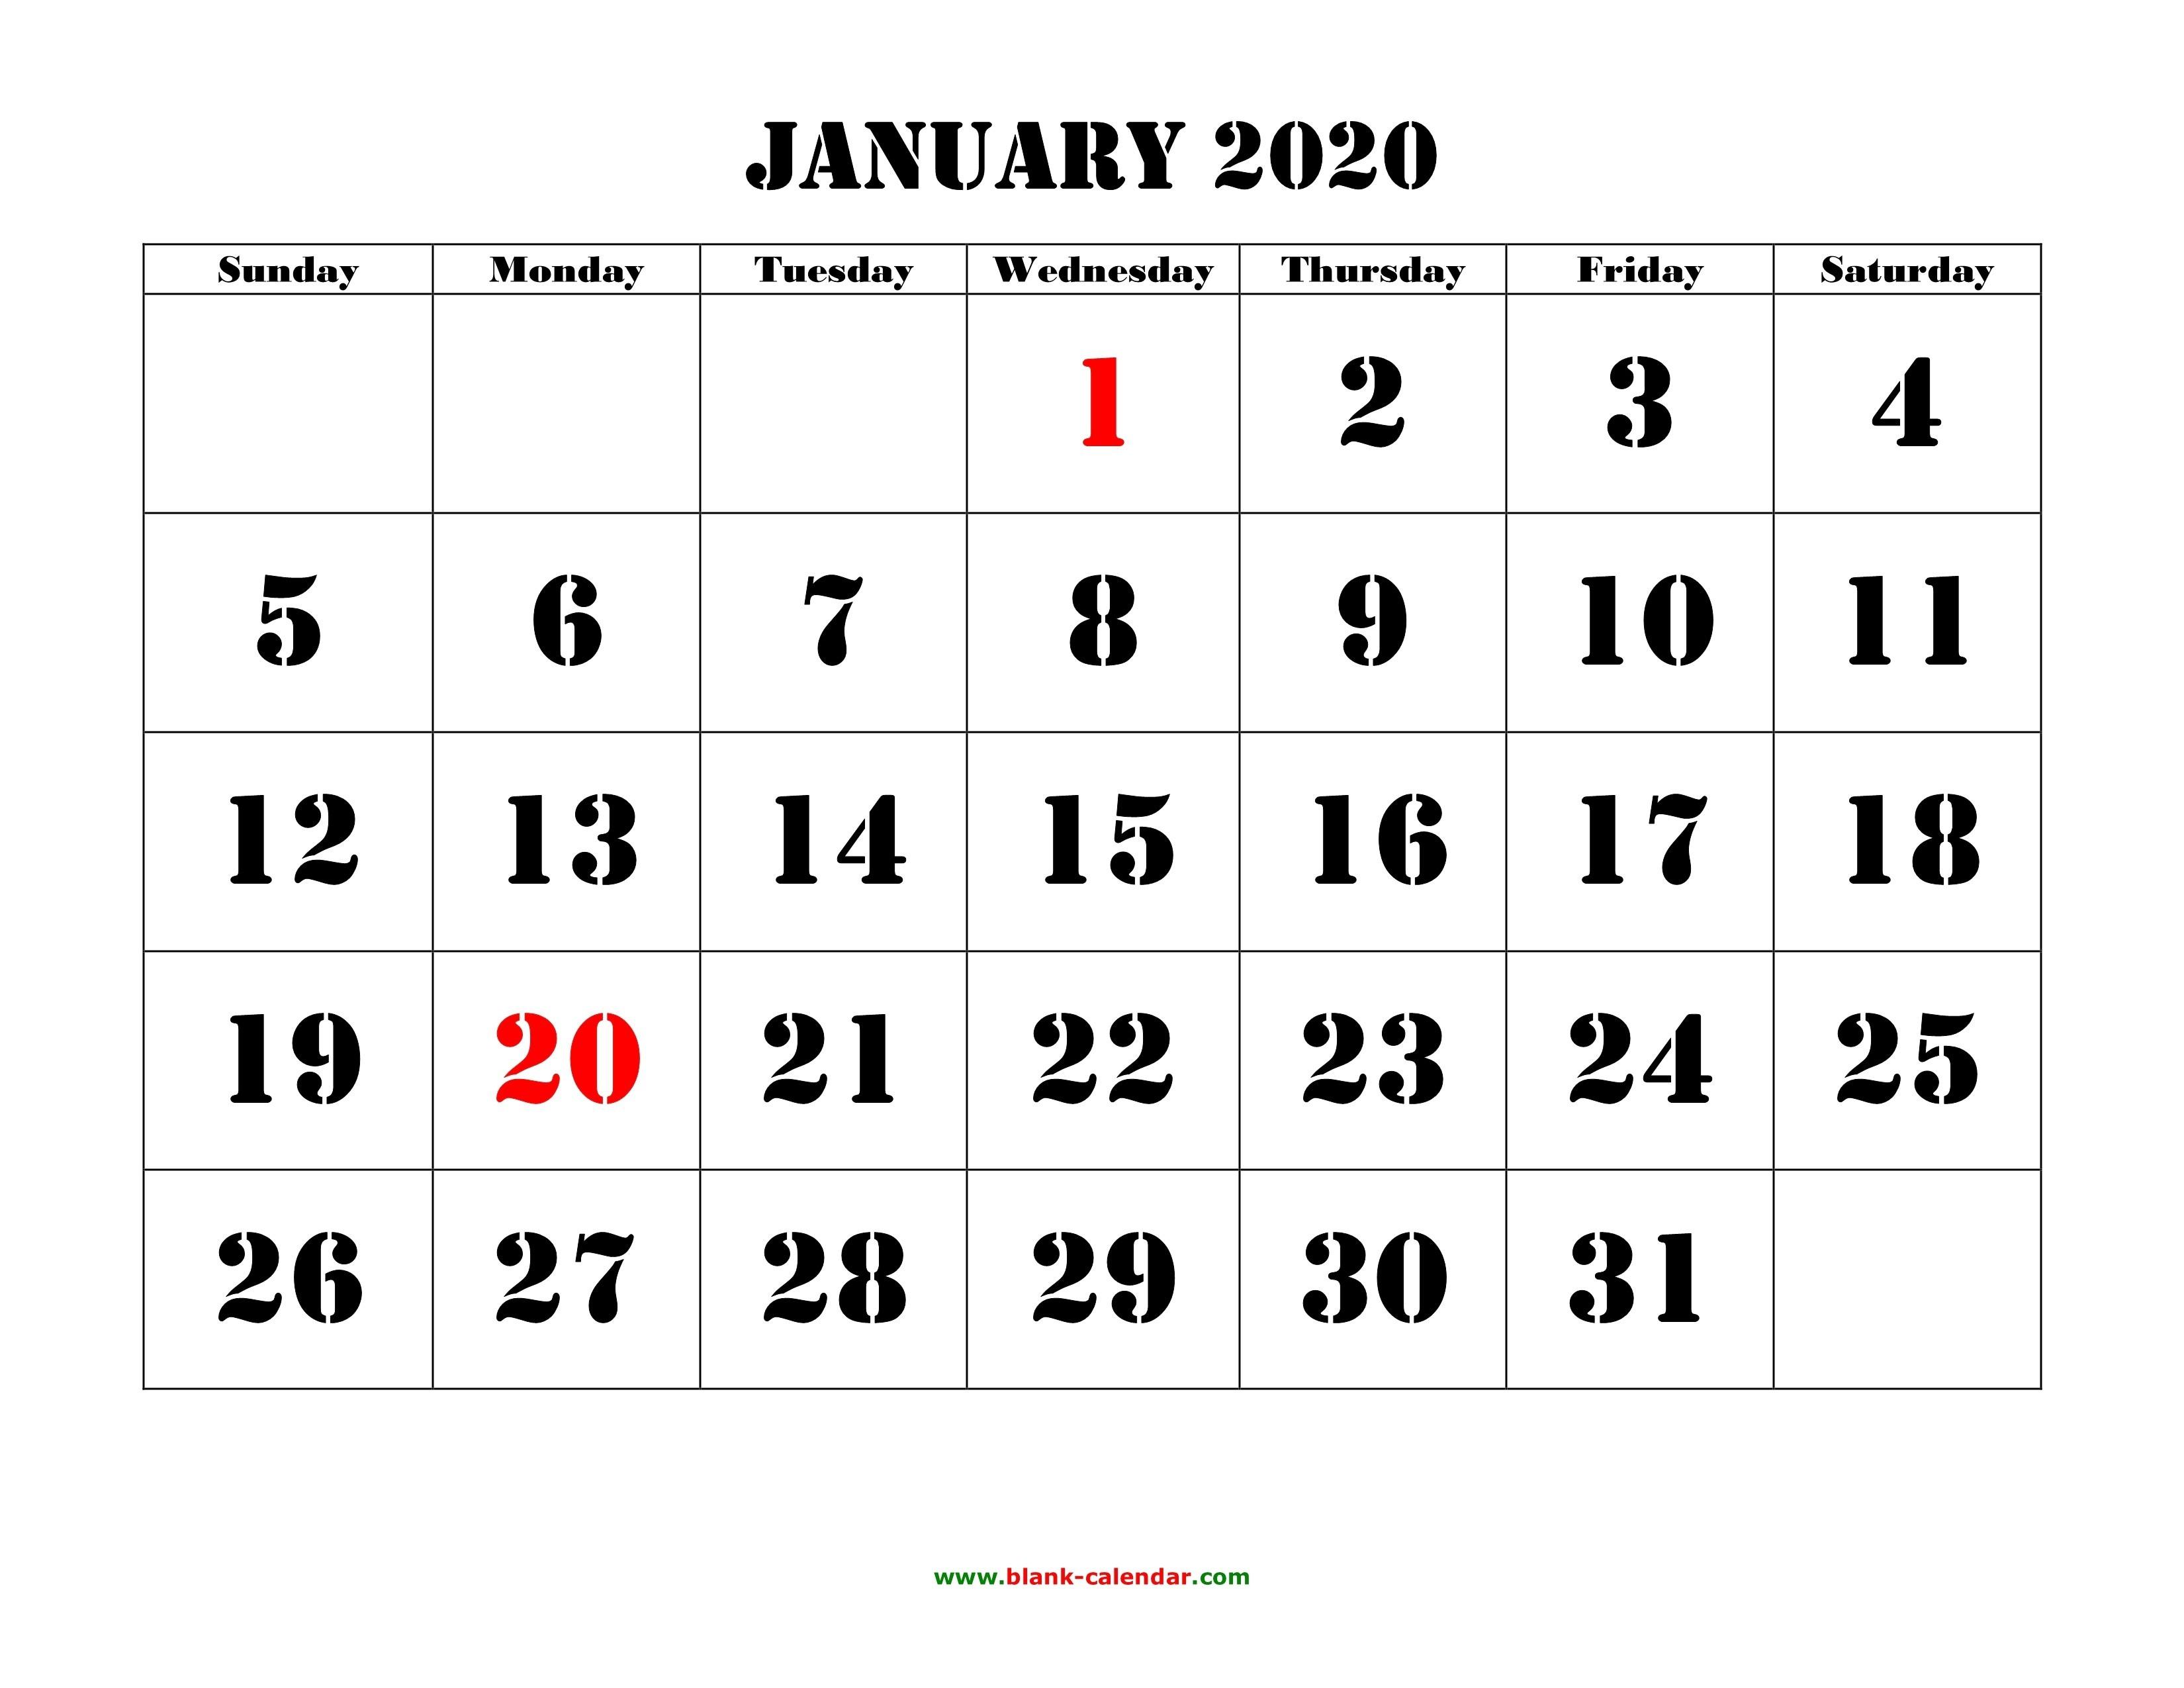 Printable January 2020 Calendar Large Font | Jcreview-January 2020 Calendar Full Moon